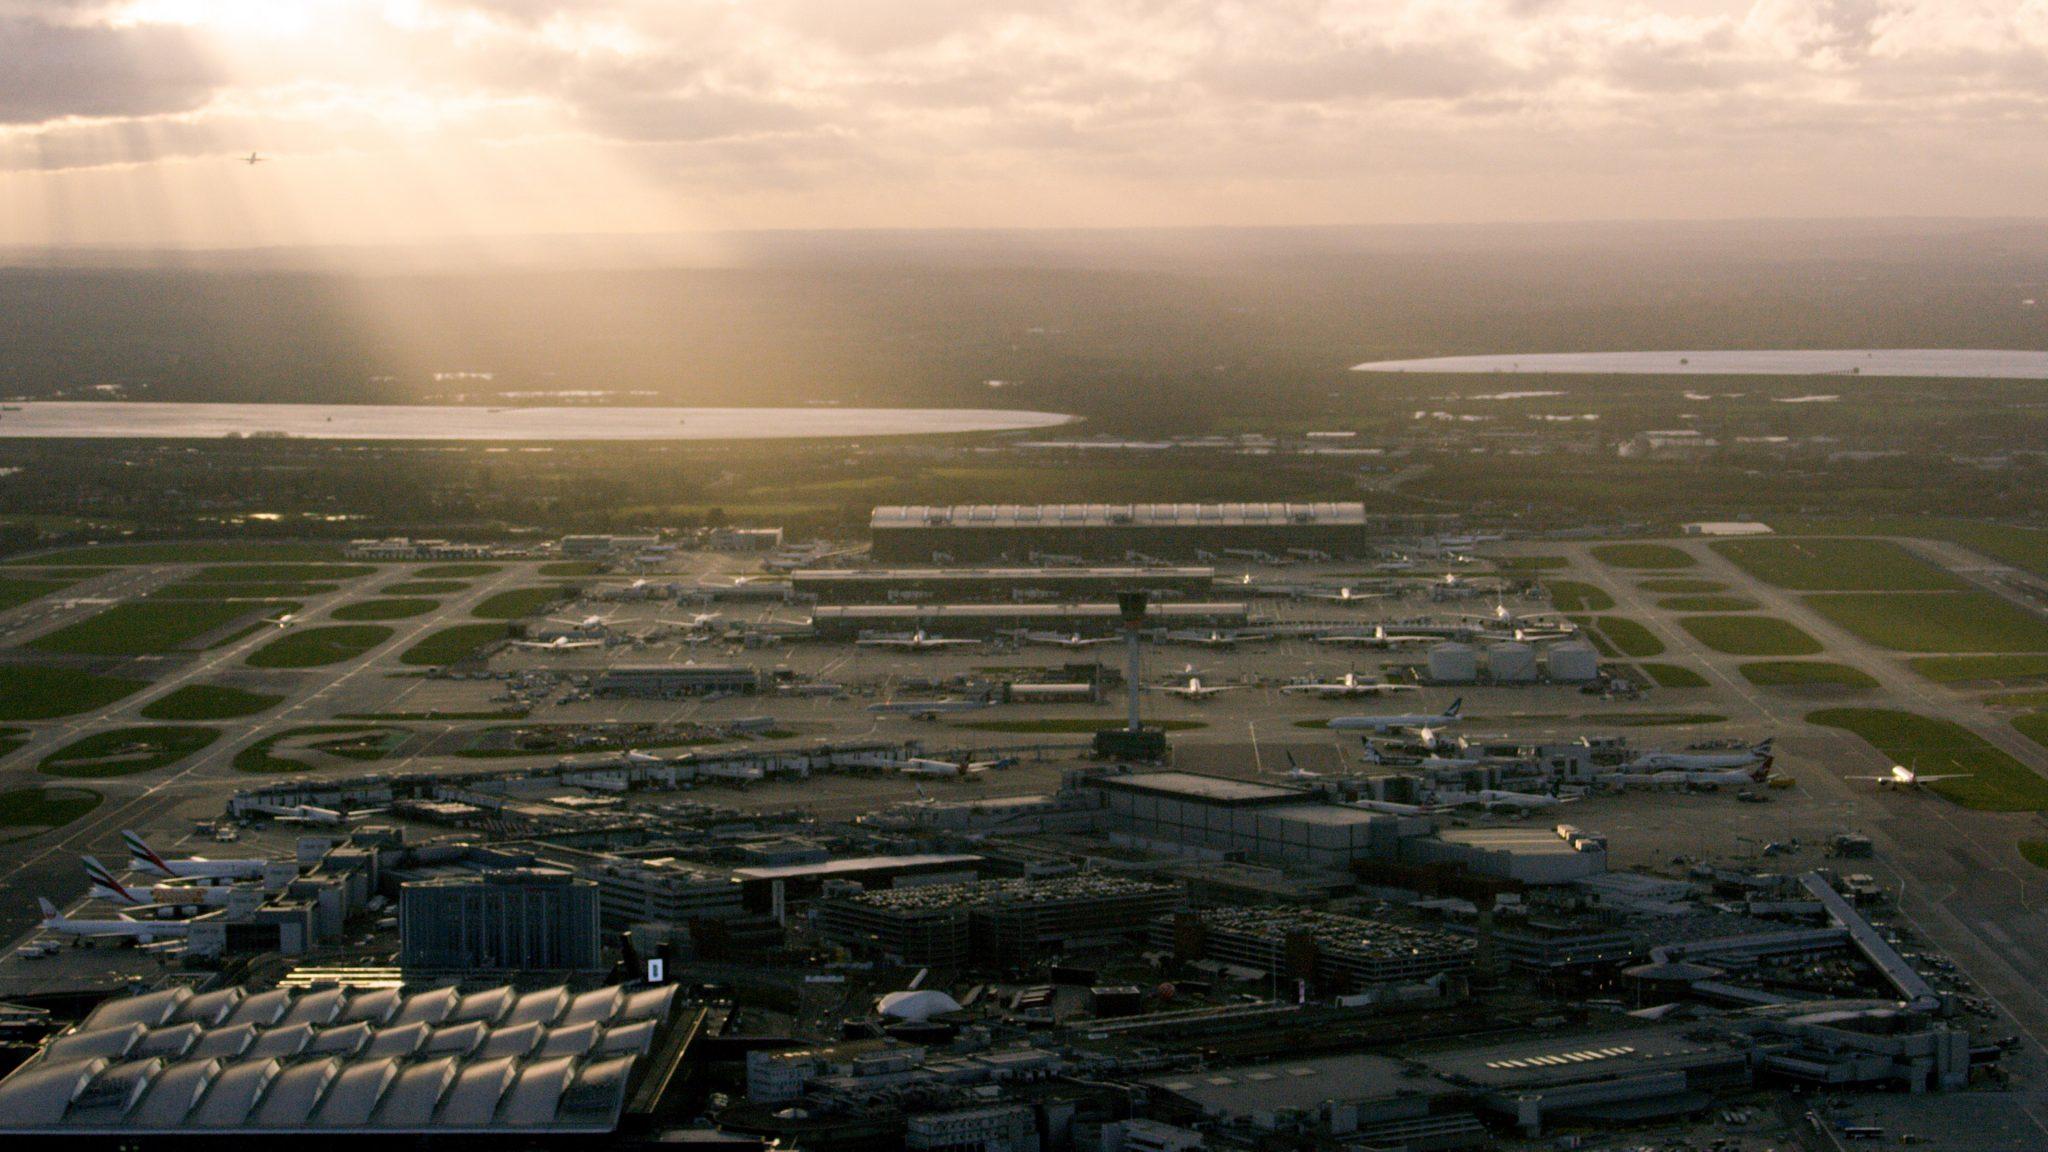 aerial shot of Heathrow Airport